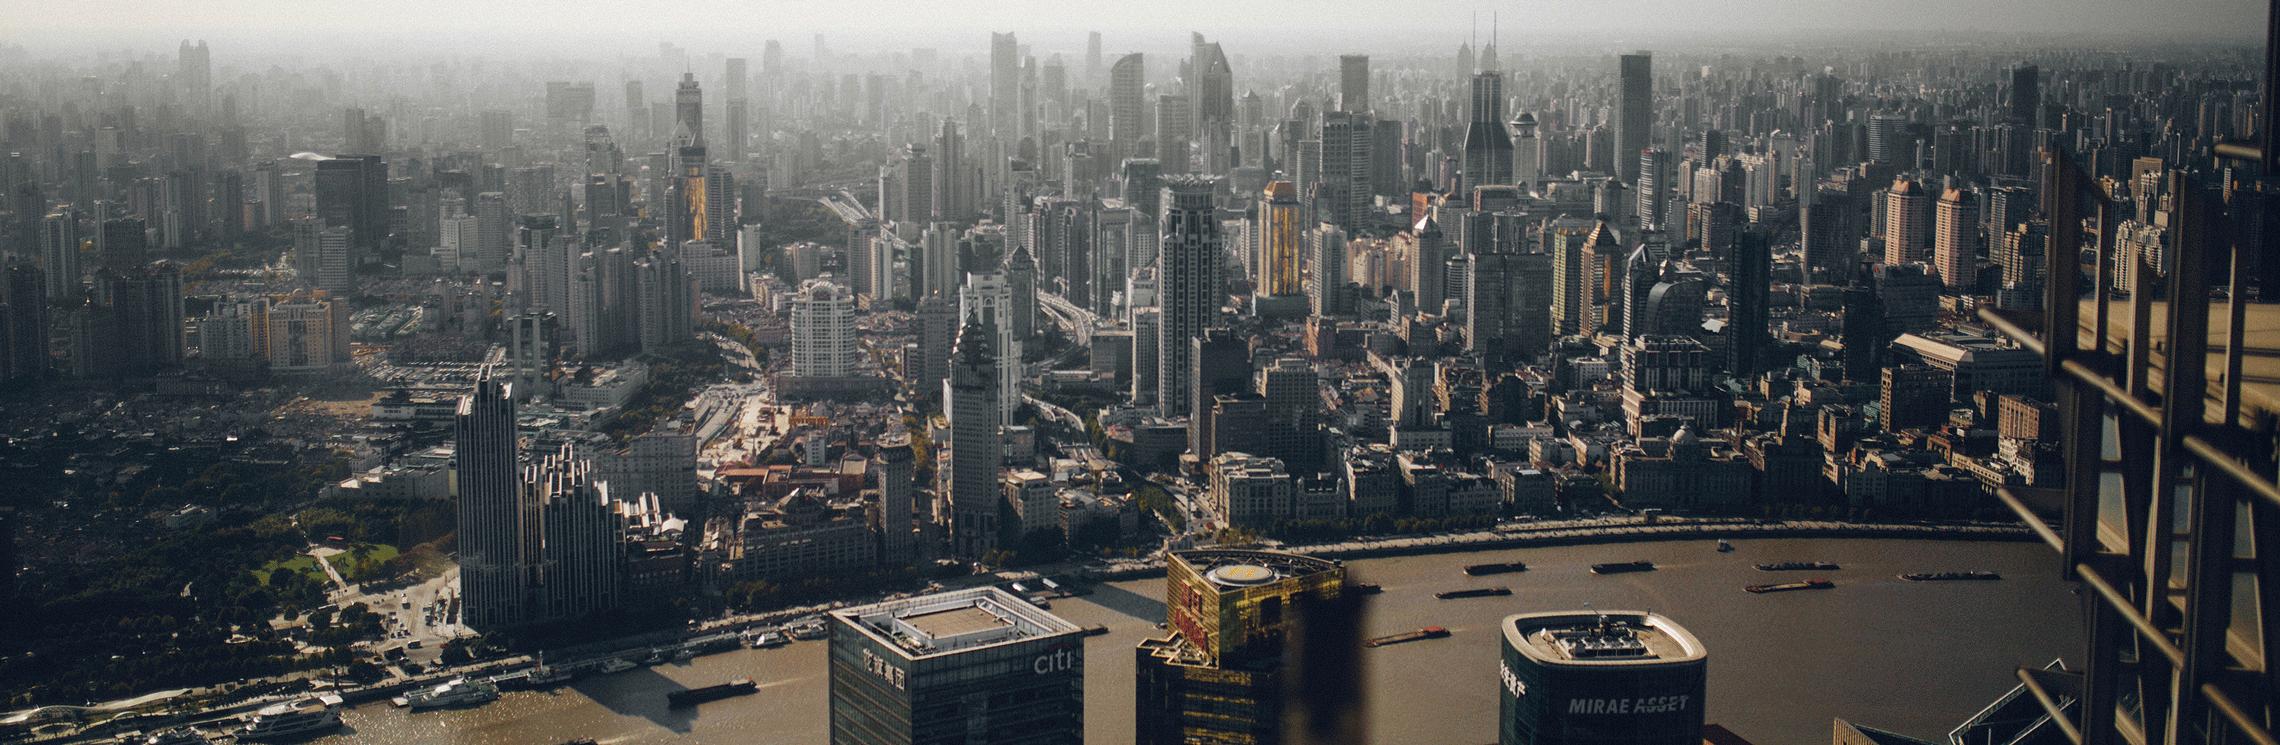 Tackling the challenge: Urban sprawl